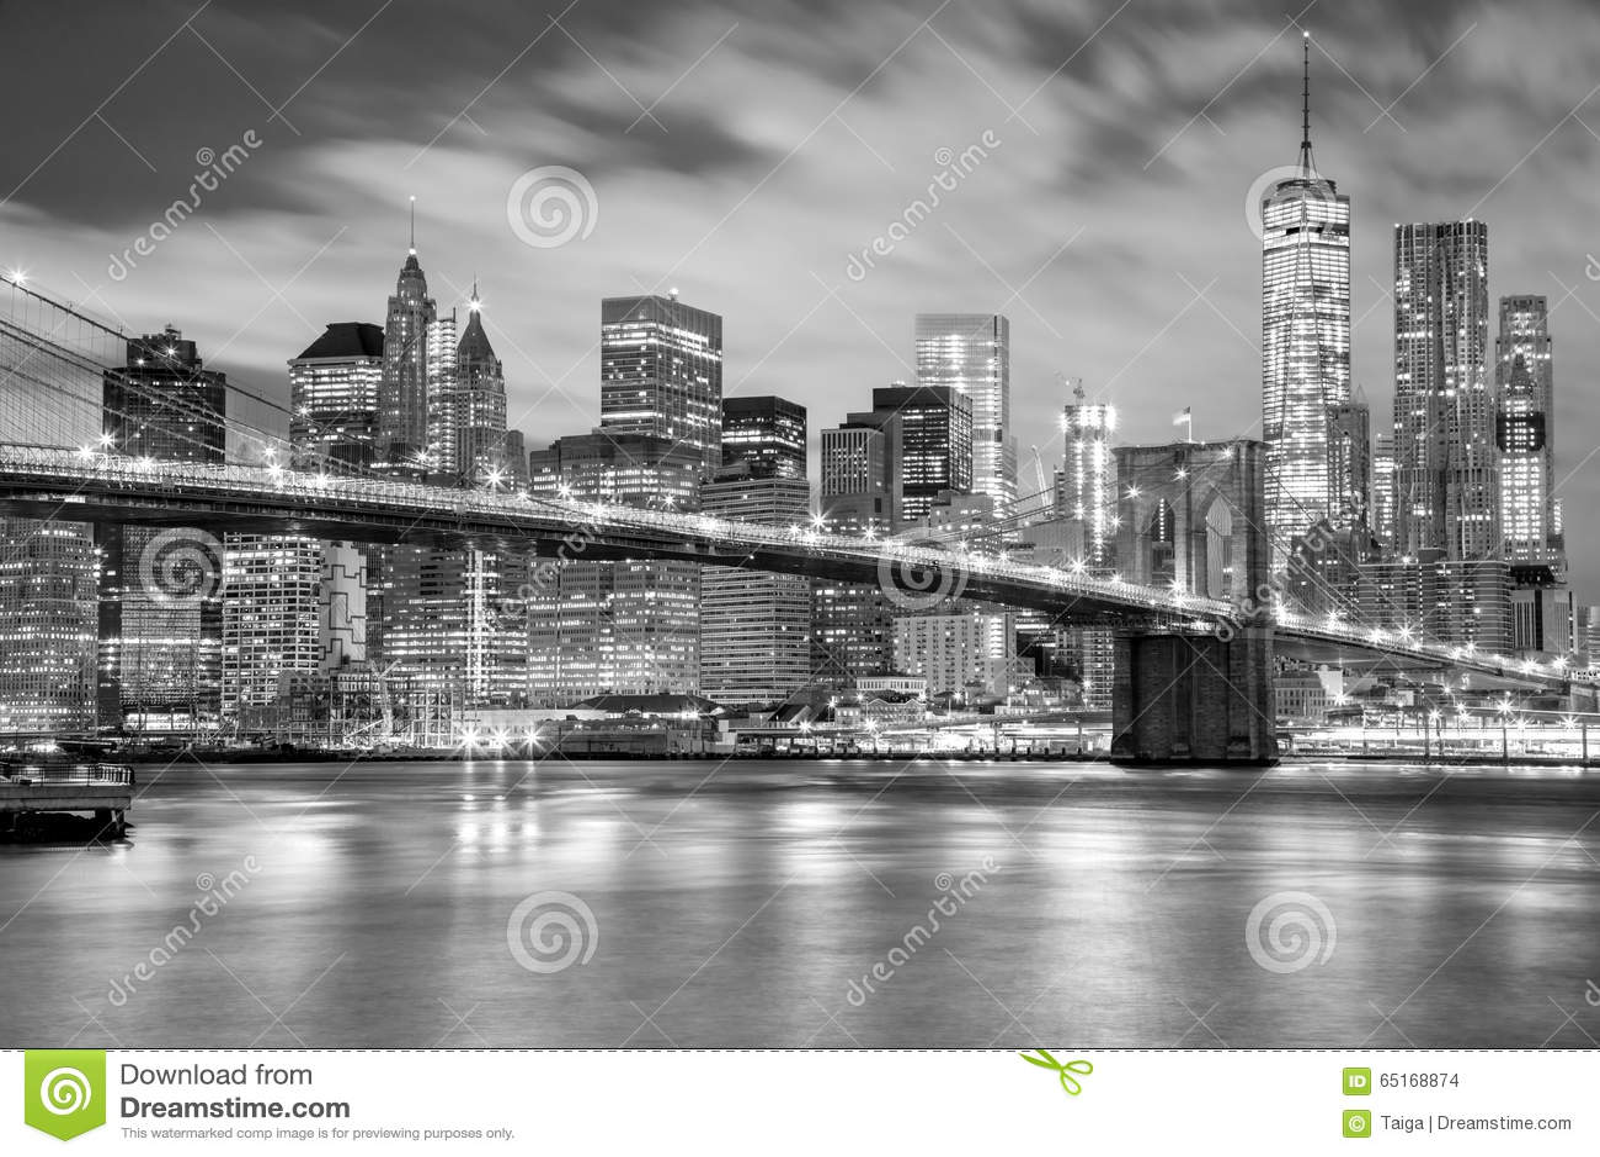 manhattan and brooklyn bridge black and white new york stock photo image 65168874. Black Bedroom Furniture Sets. Home Design Ideas